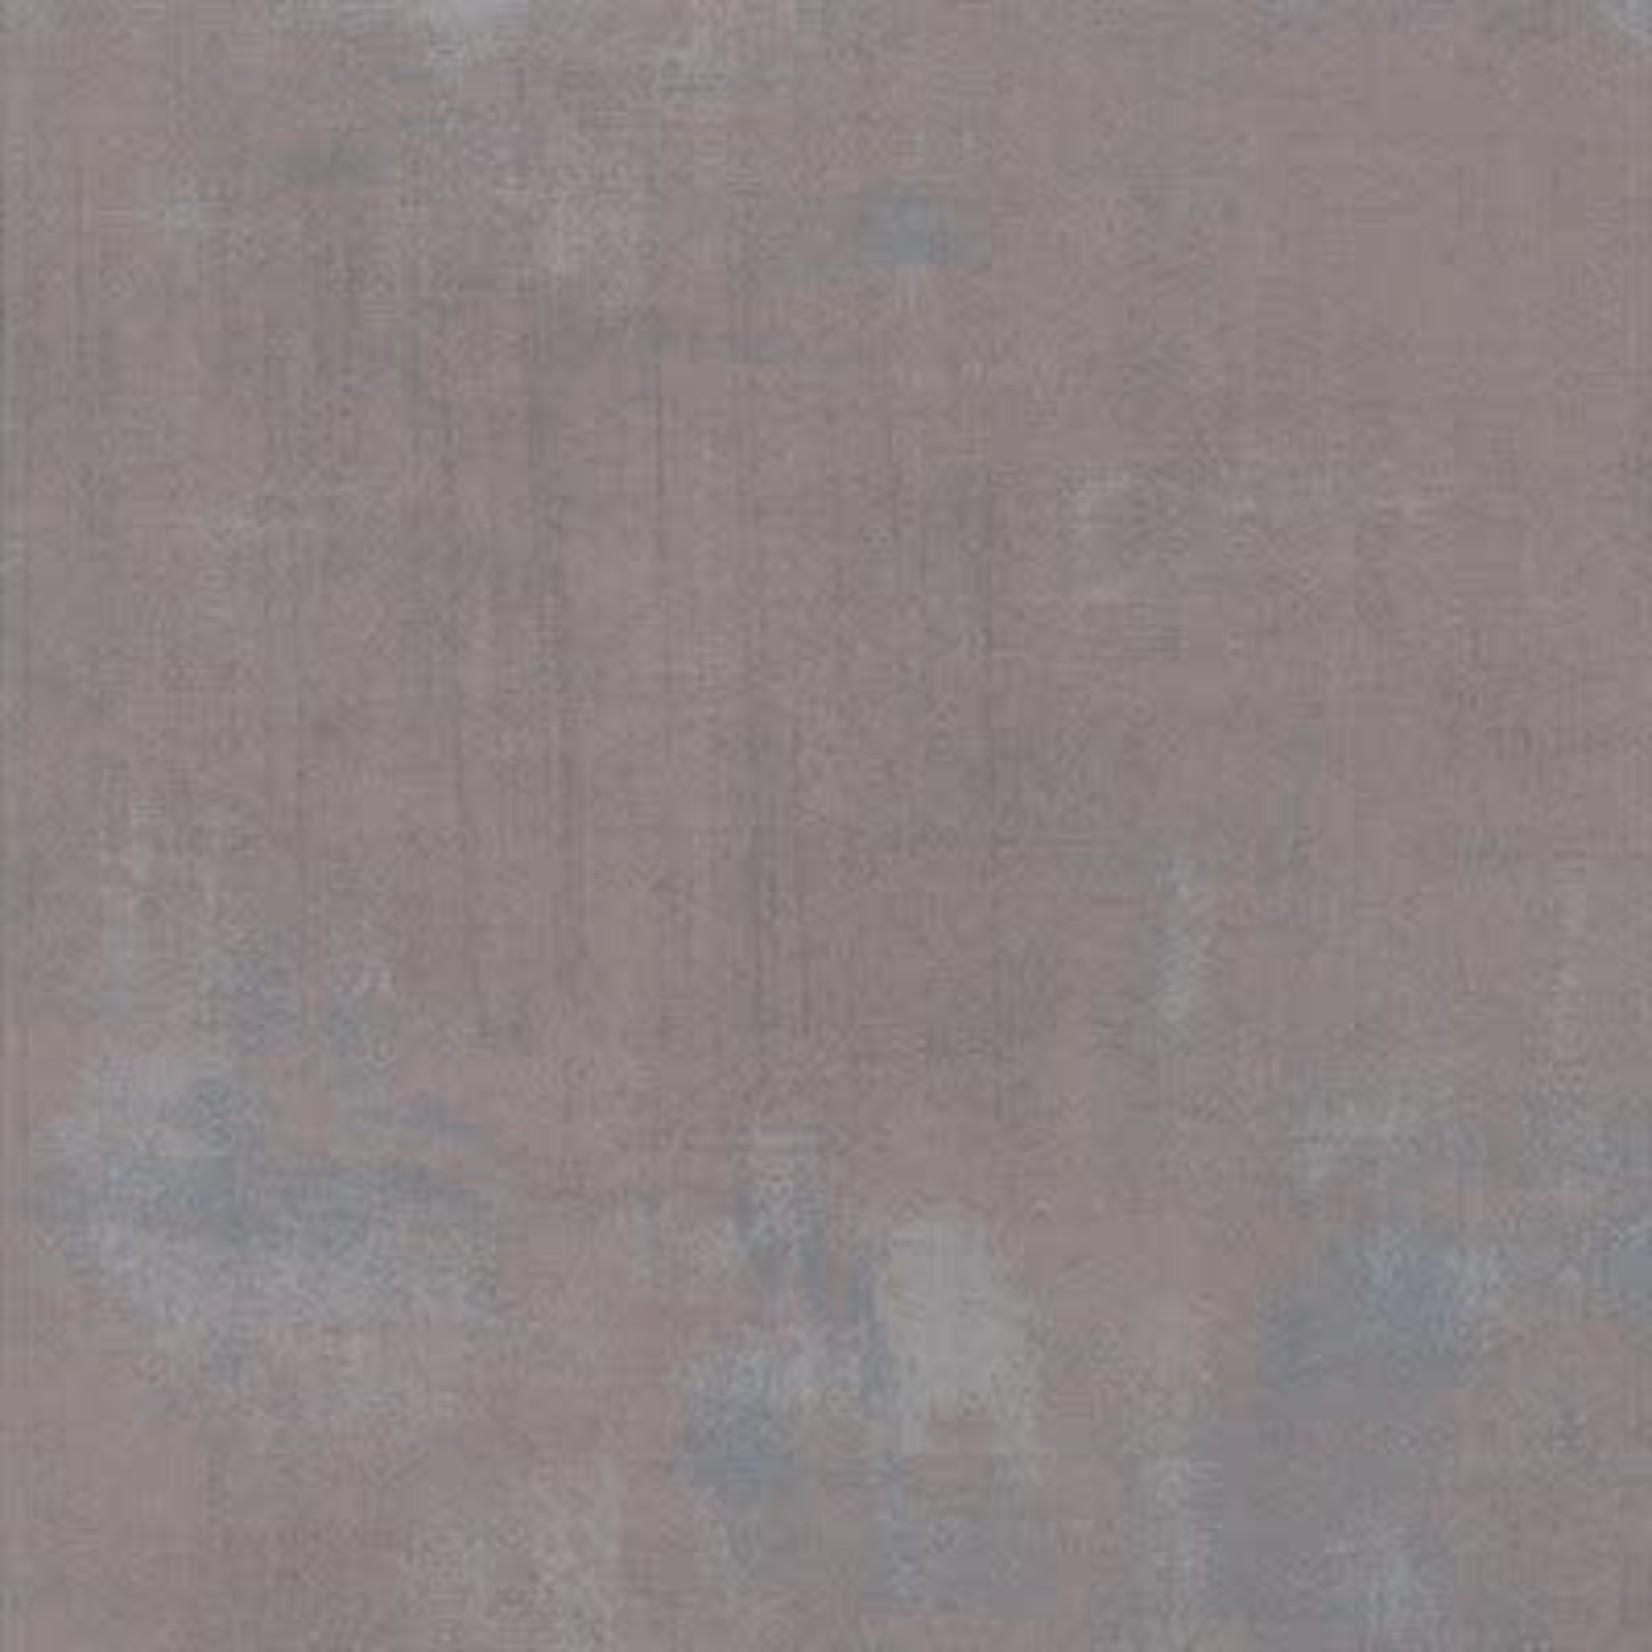 Moda Grunge Basics Grunge - Stone per cm or $20/m